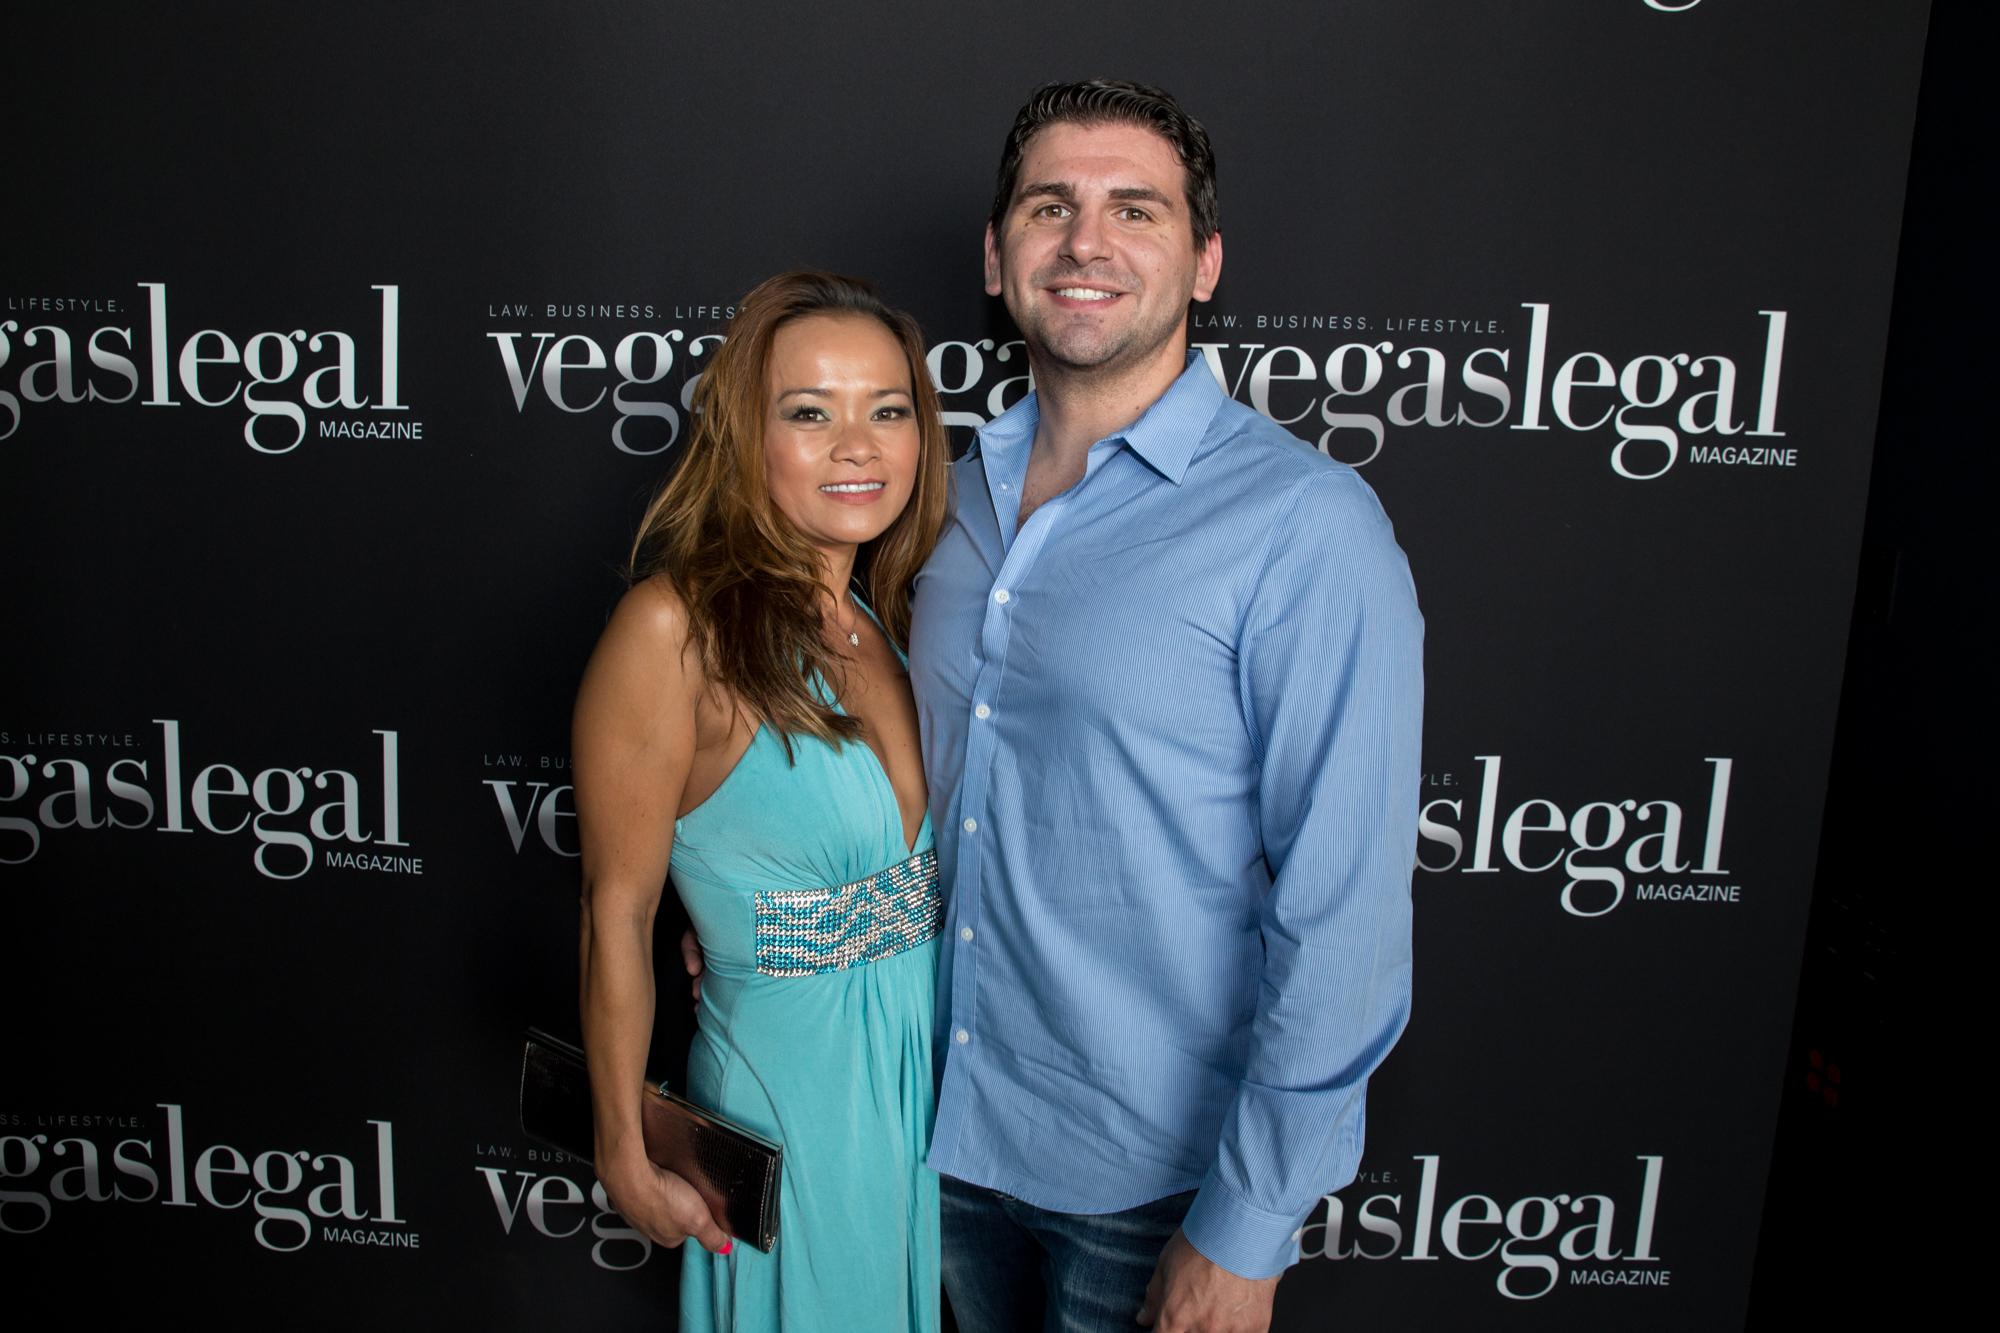 Vegas Legal Magazine (197)